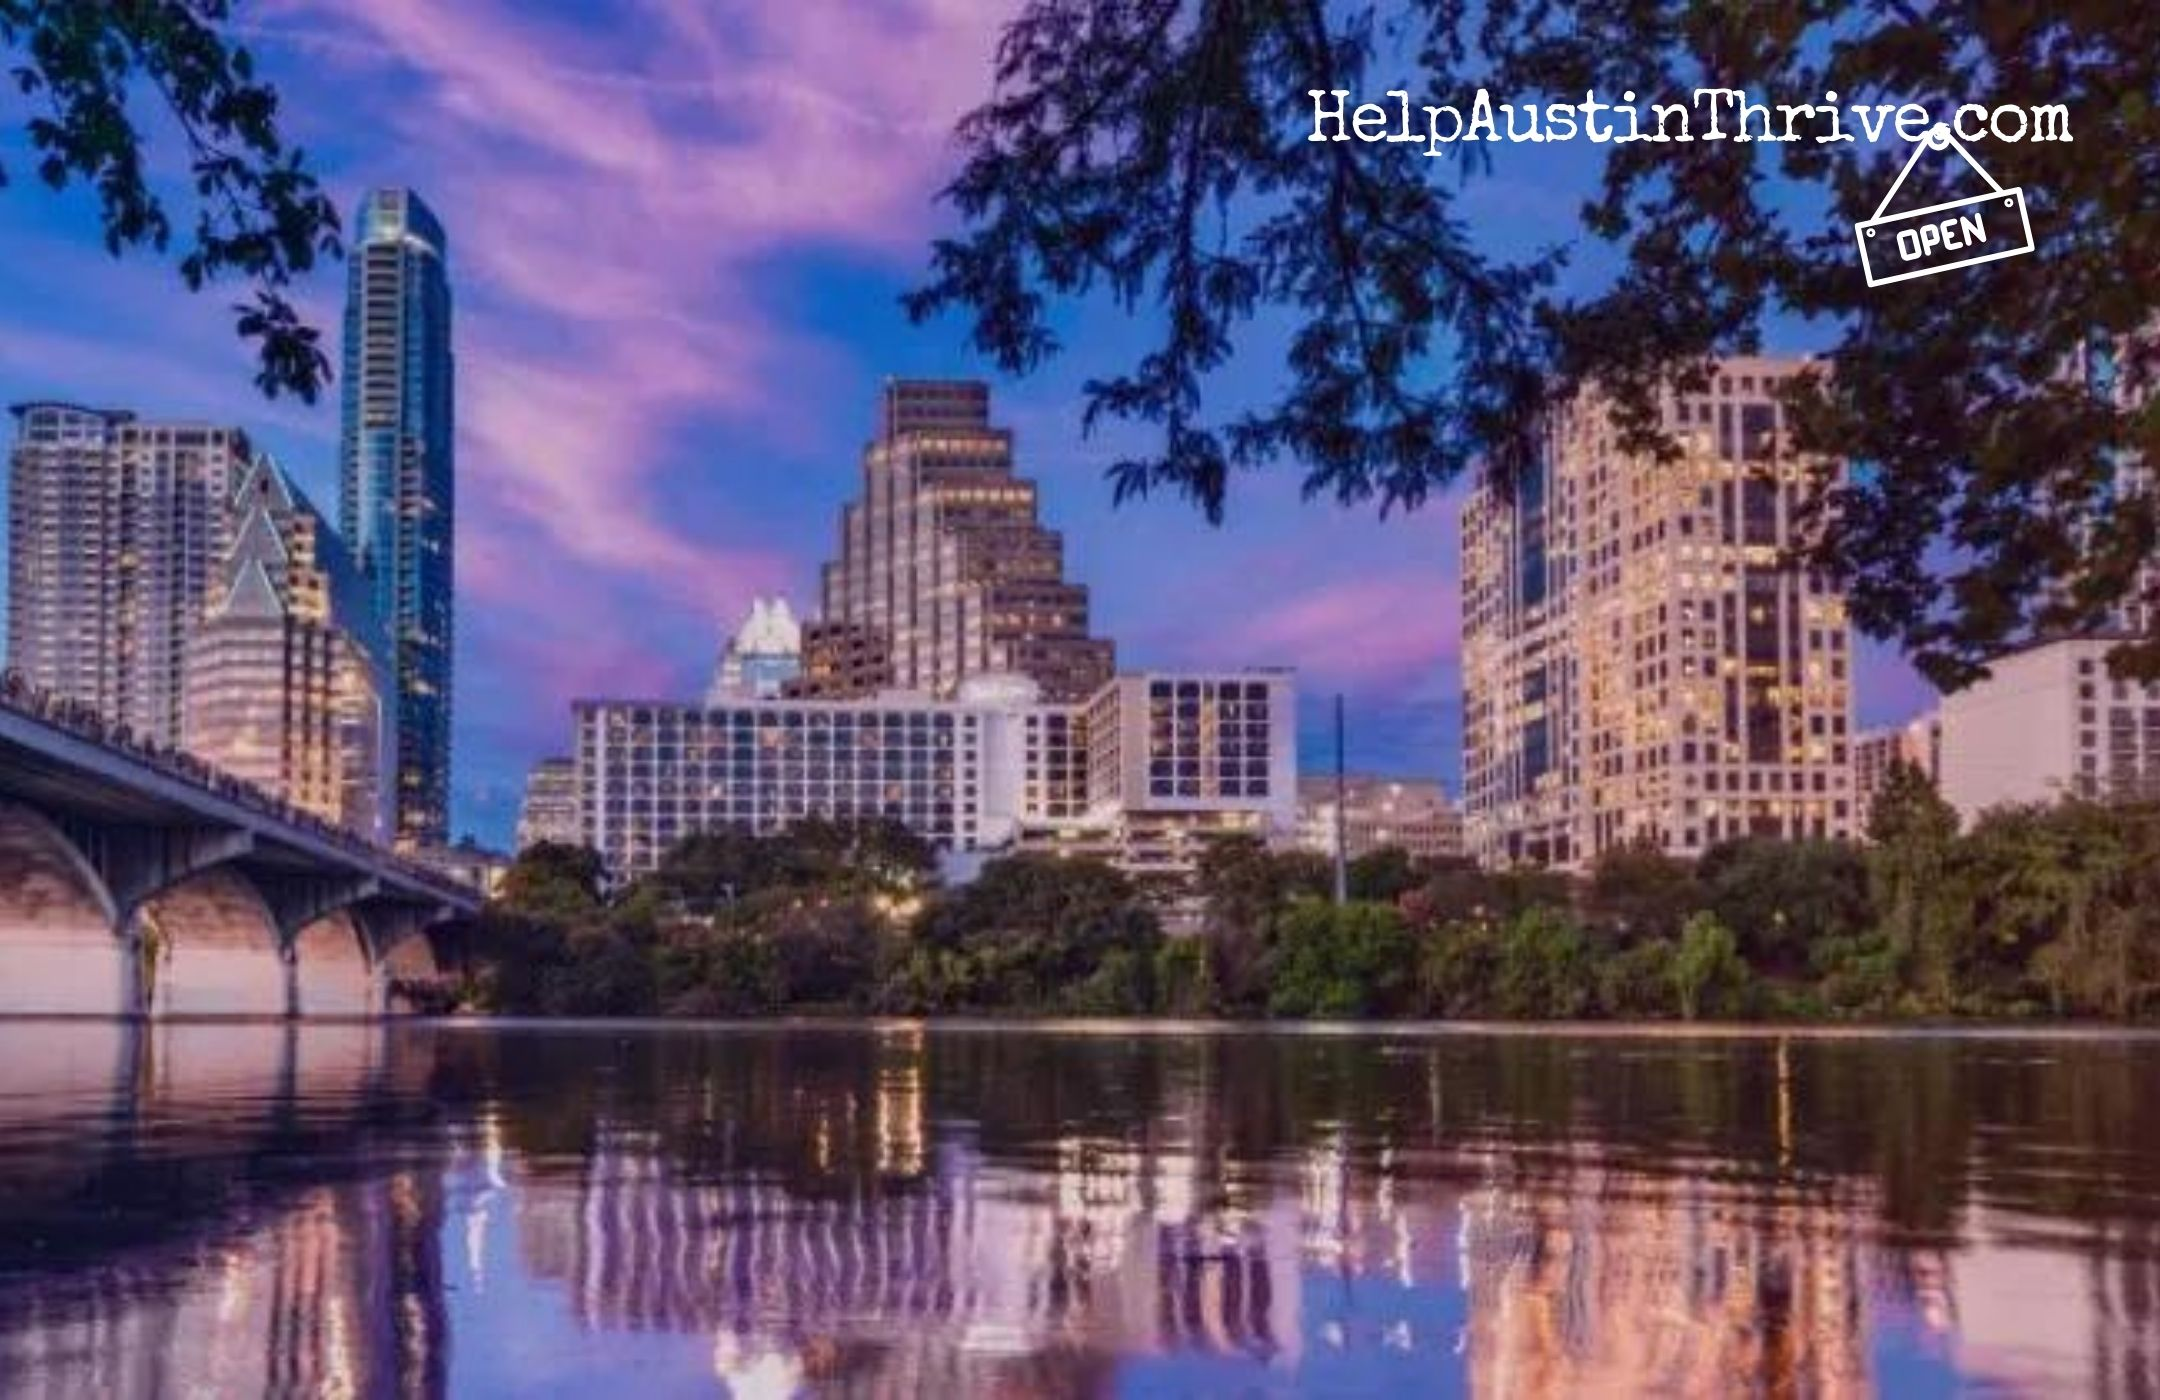 City of Austin Needs Assessment